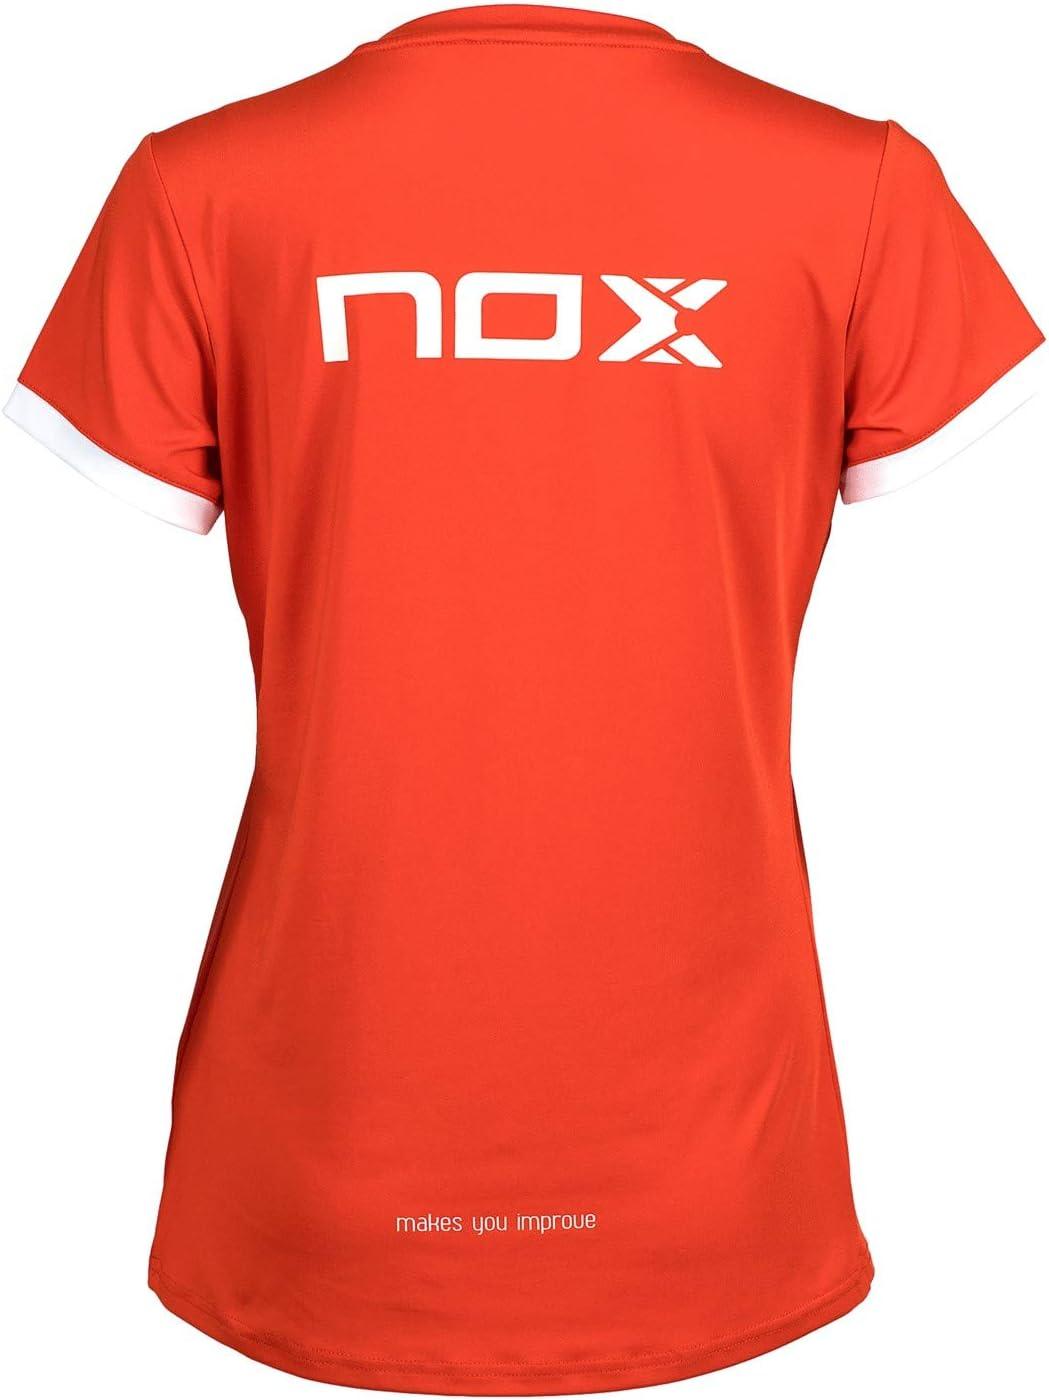 Nox Camiseta Team roja con Logo Blanco